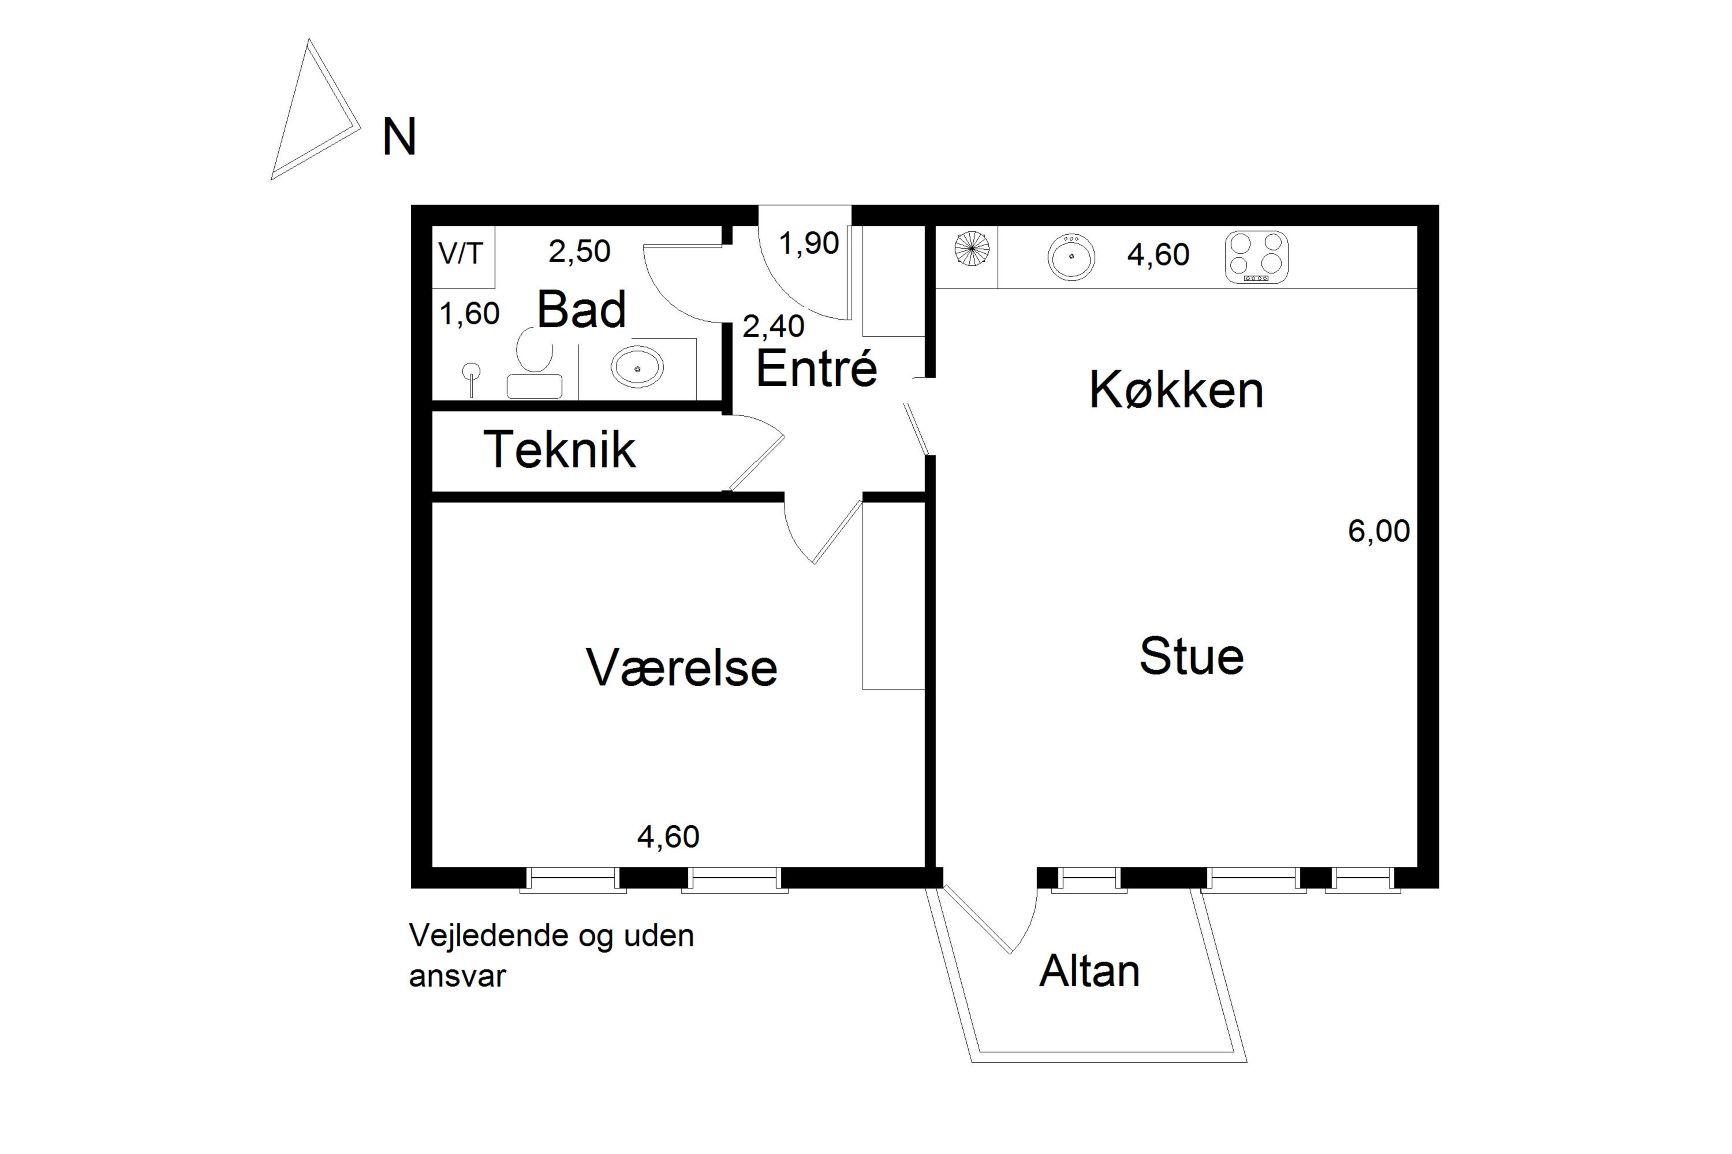 Plantegning for Mariane Thomsens Gade 36, 1. lejl. 2., 8000 Aarhus C